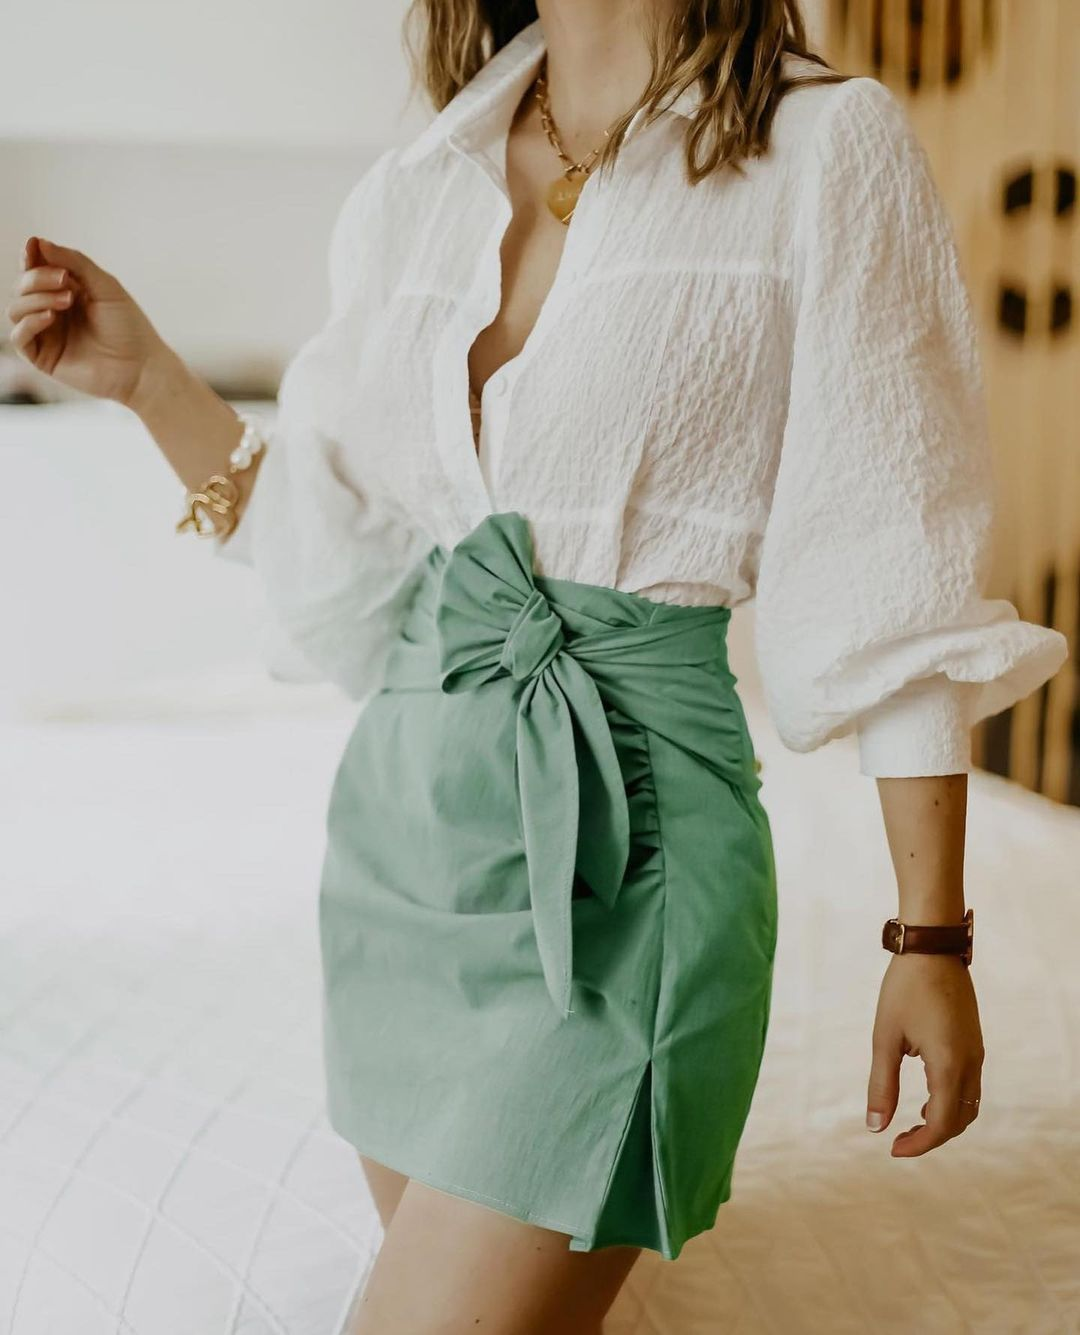 mini skirt with bow de Zara sur zara.outfits